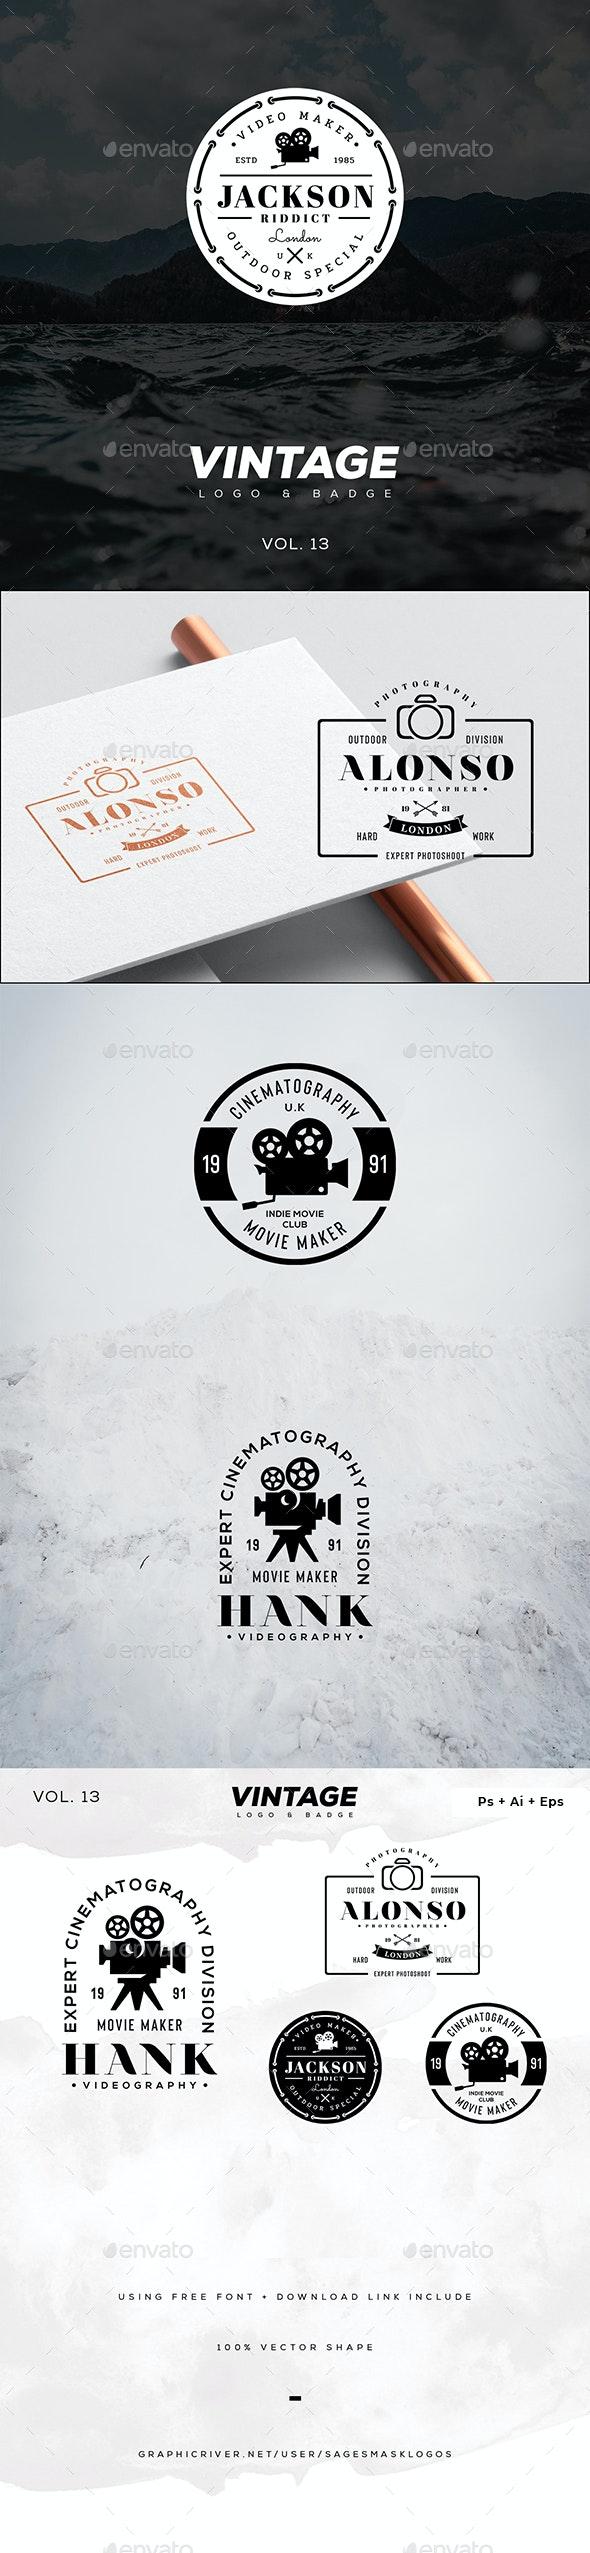 Vintage Logo & Badge Vol. 13 - Badges & Stickers Web Elements